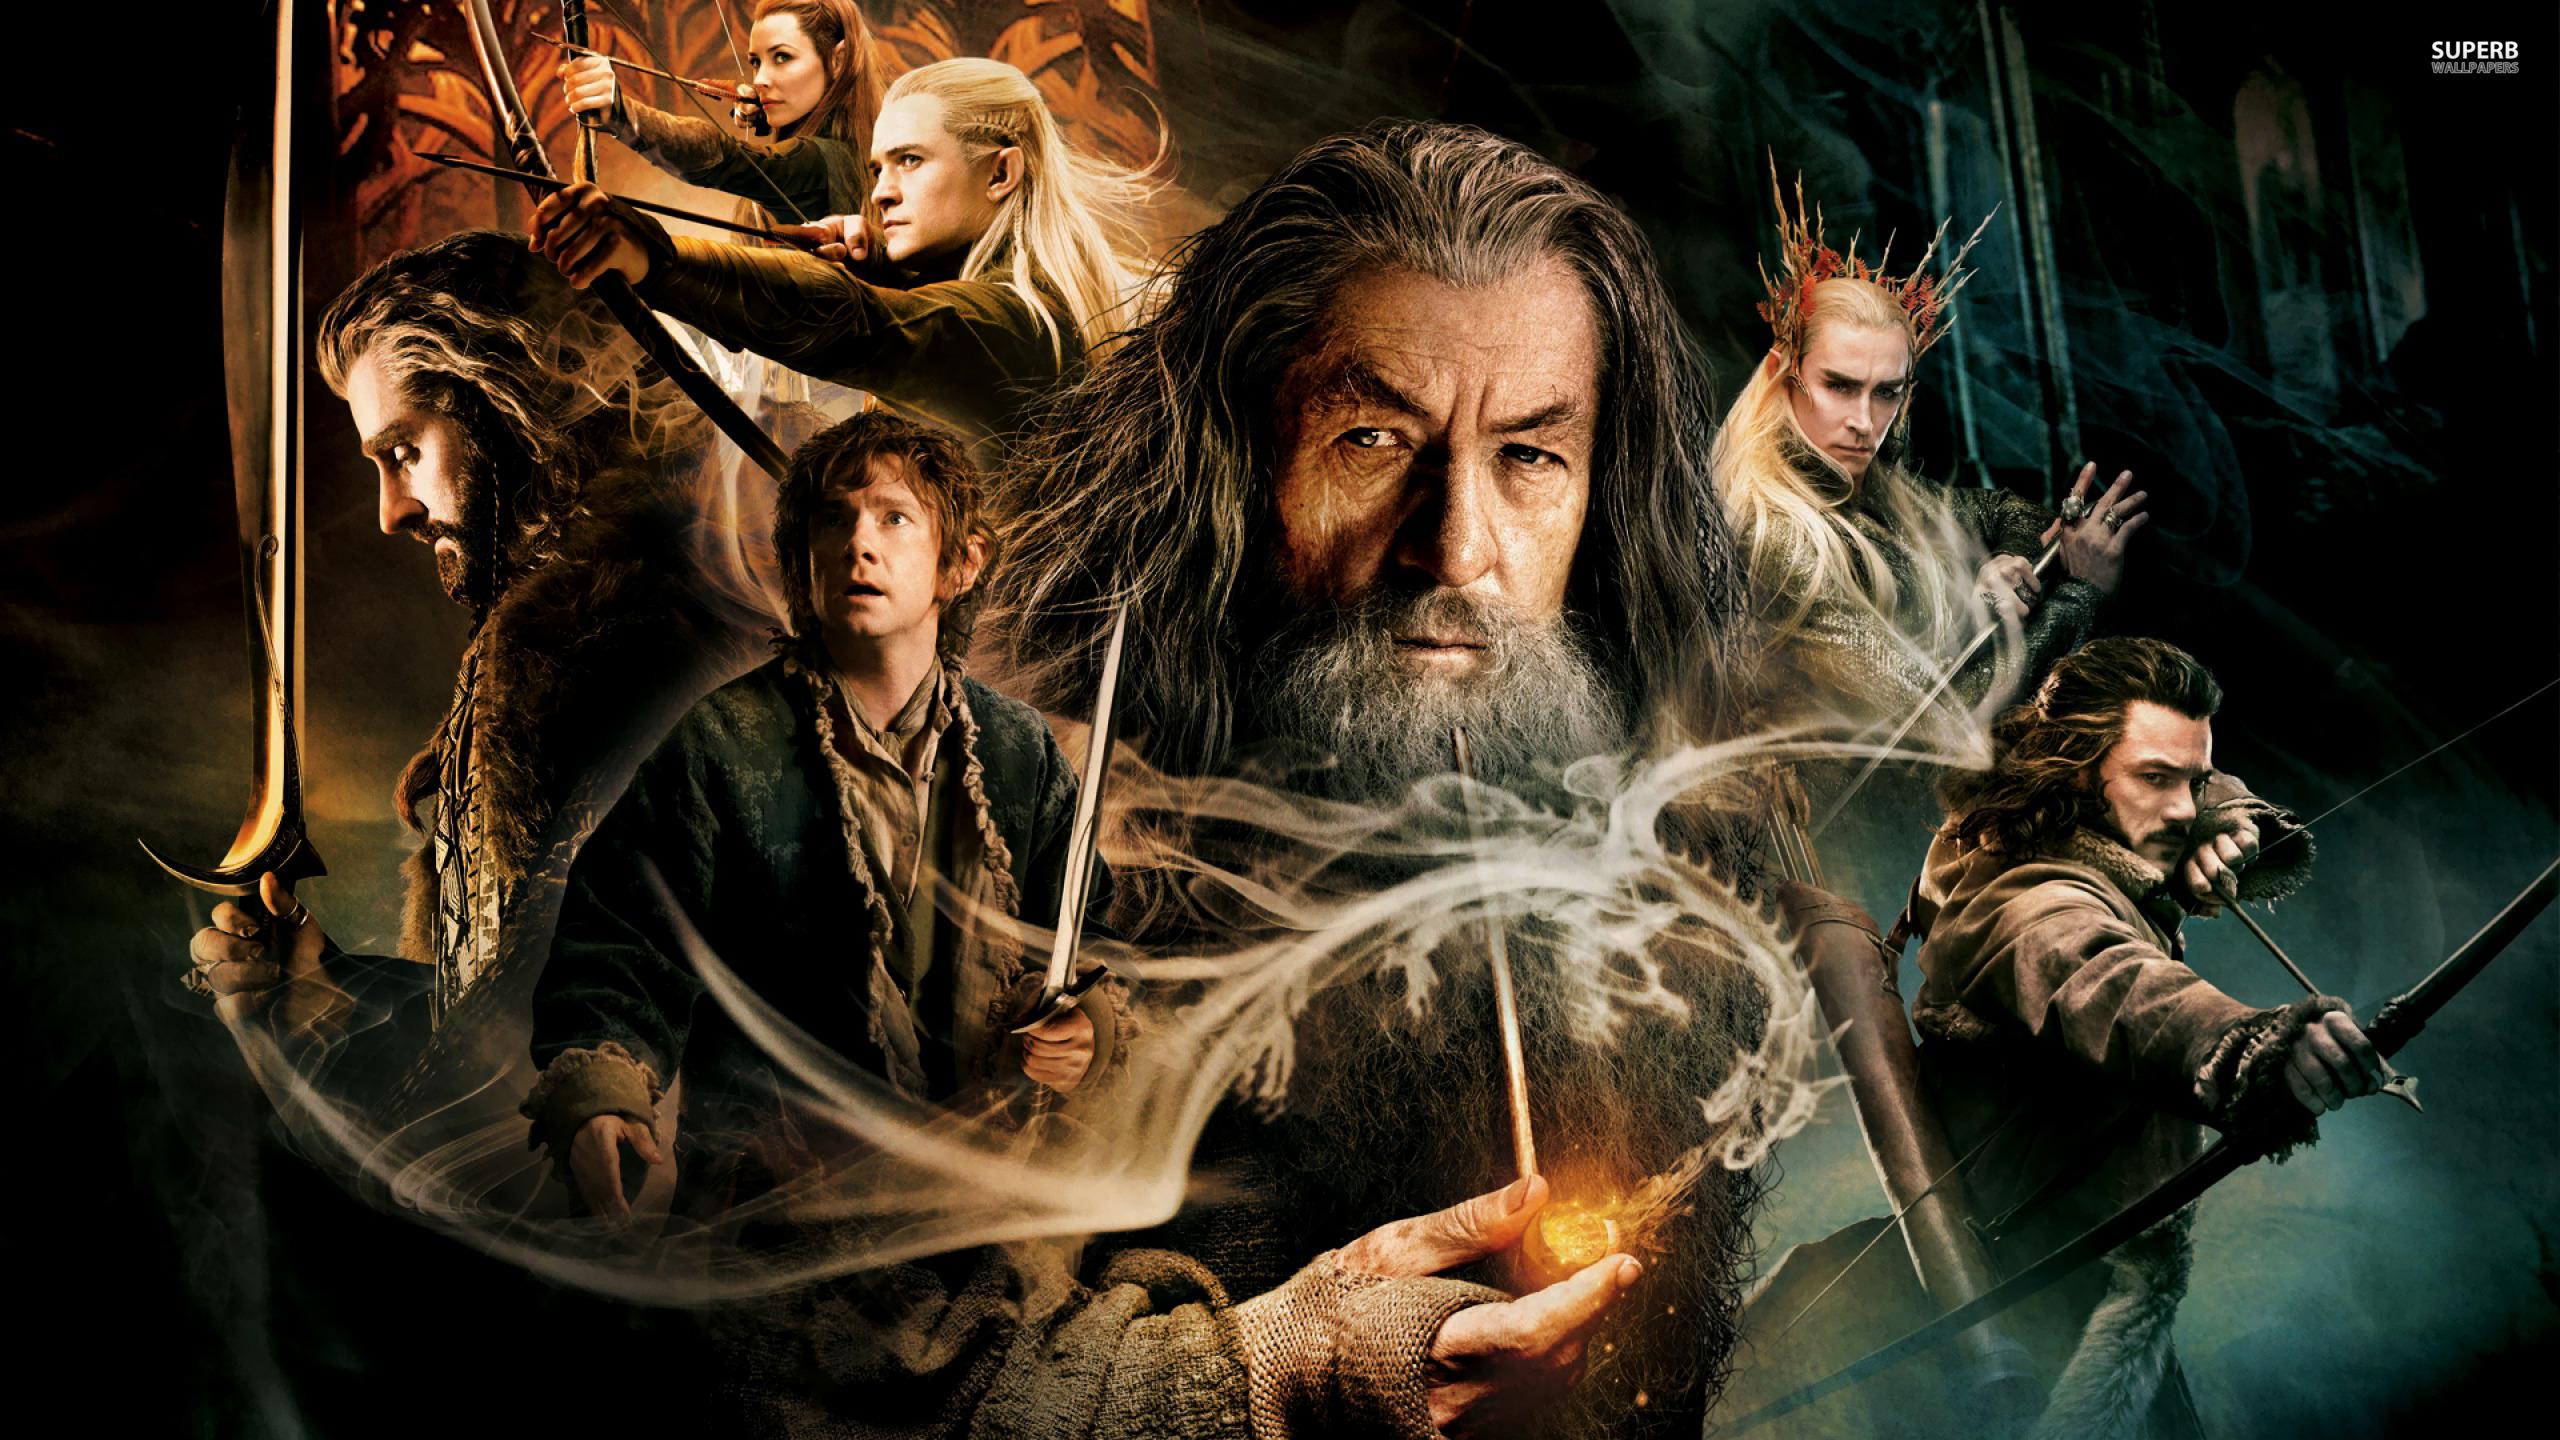 hobbit 3 turkce dublaj